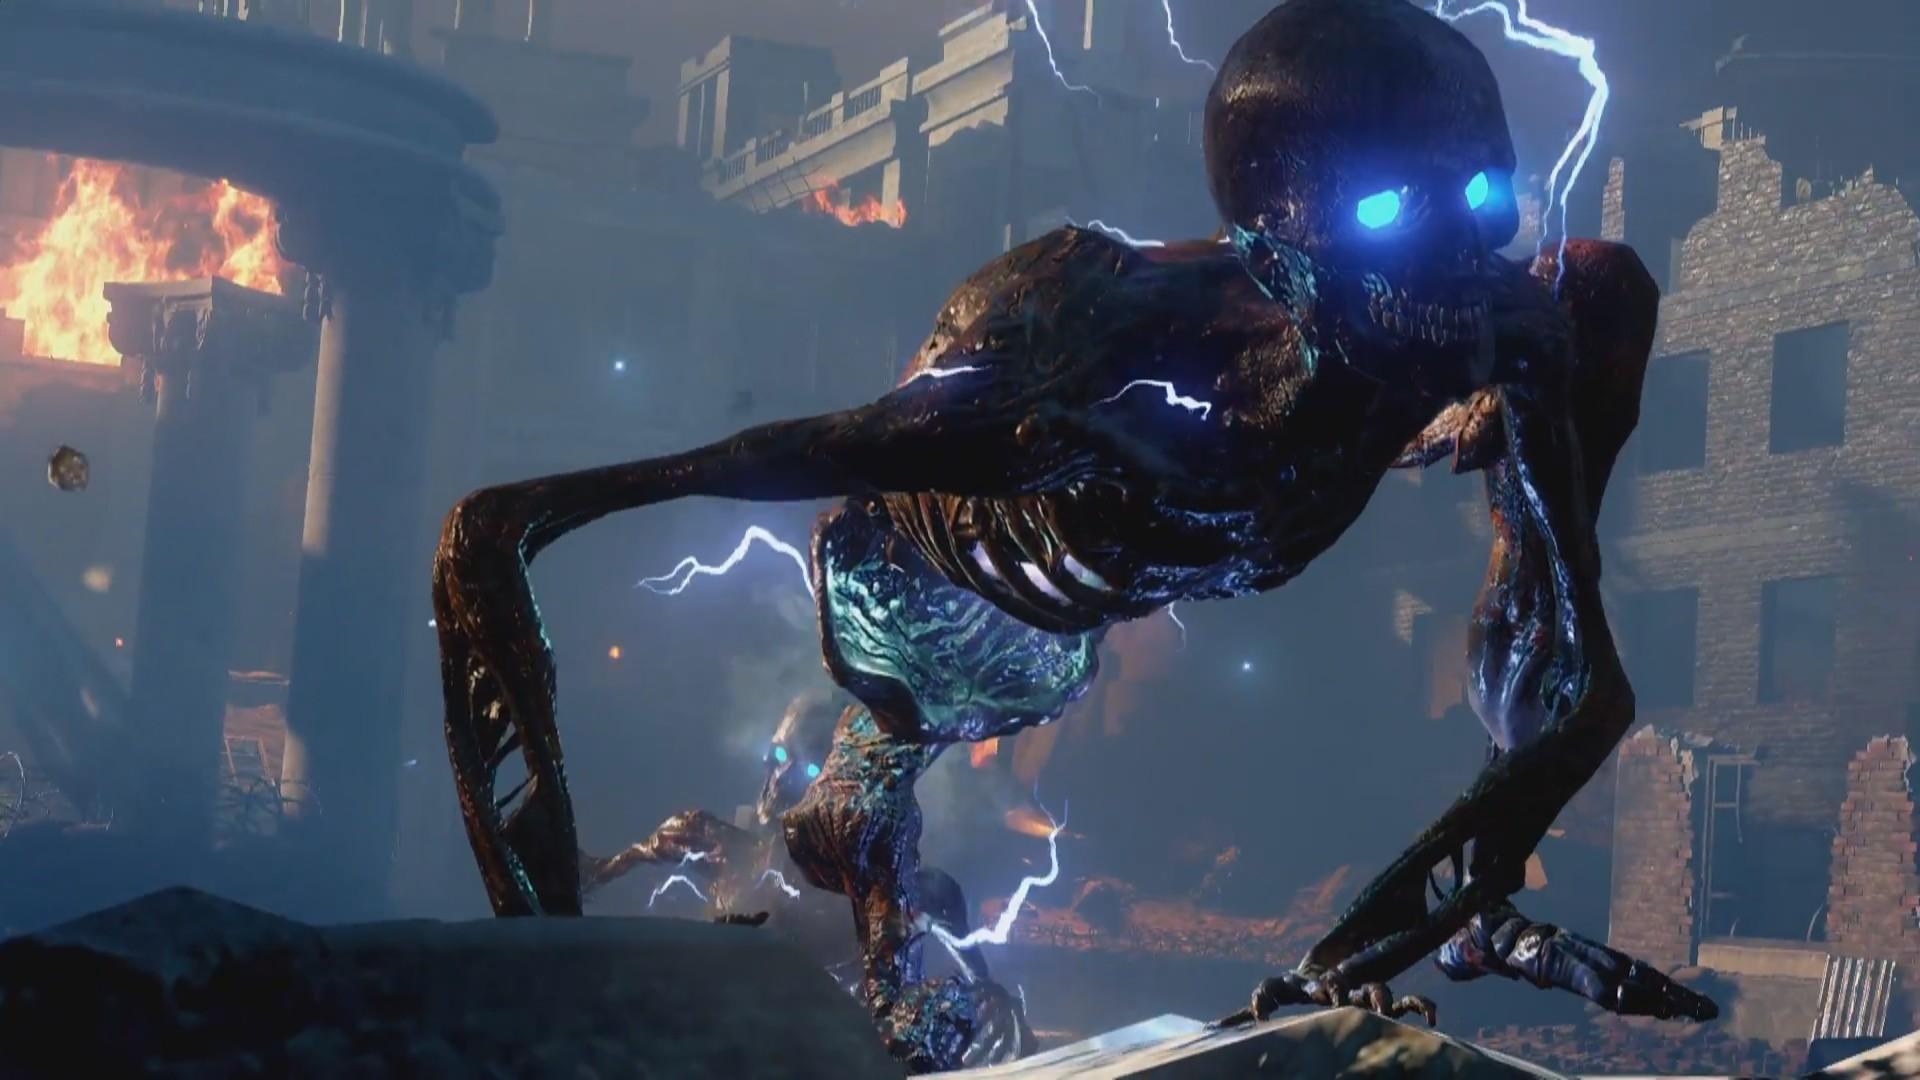 3. Electrified Skeletons